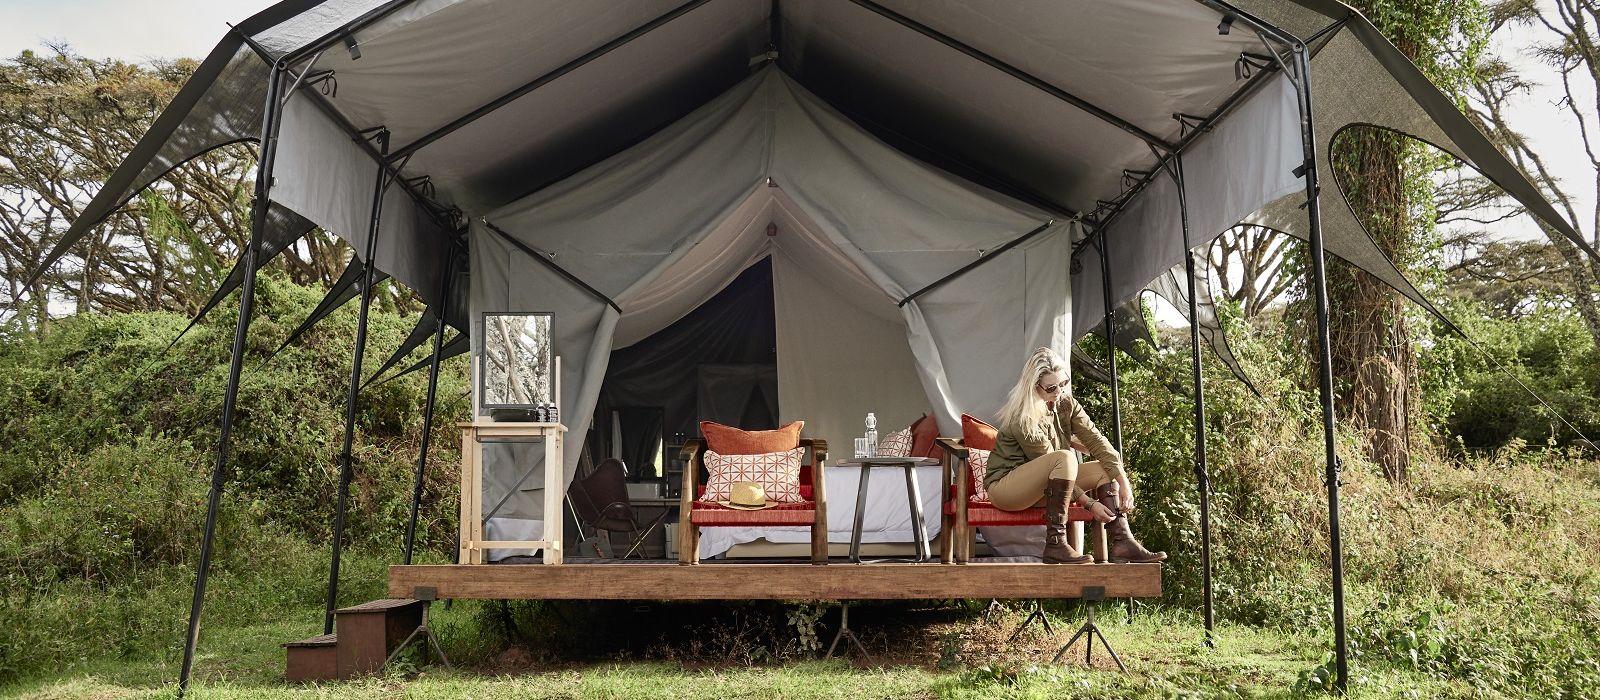 Hotel Sanctuary Ngorongoro Crater Camp Tanzania